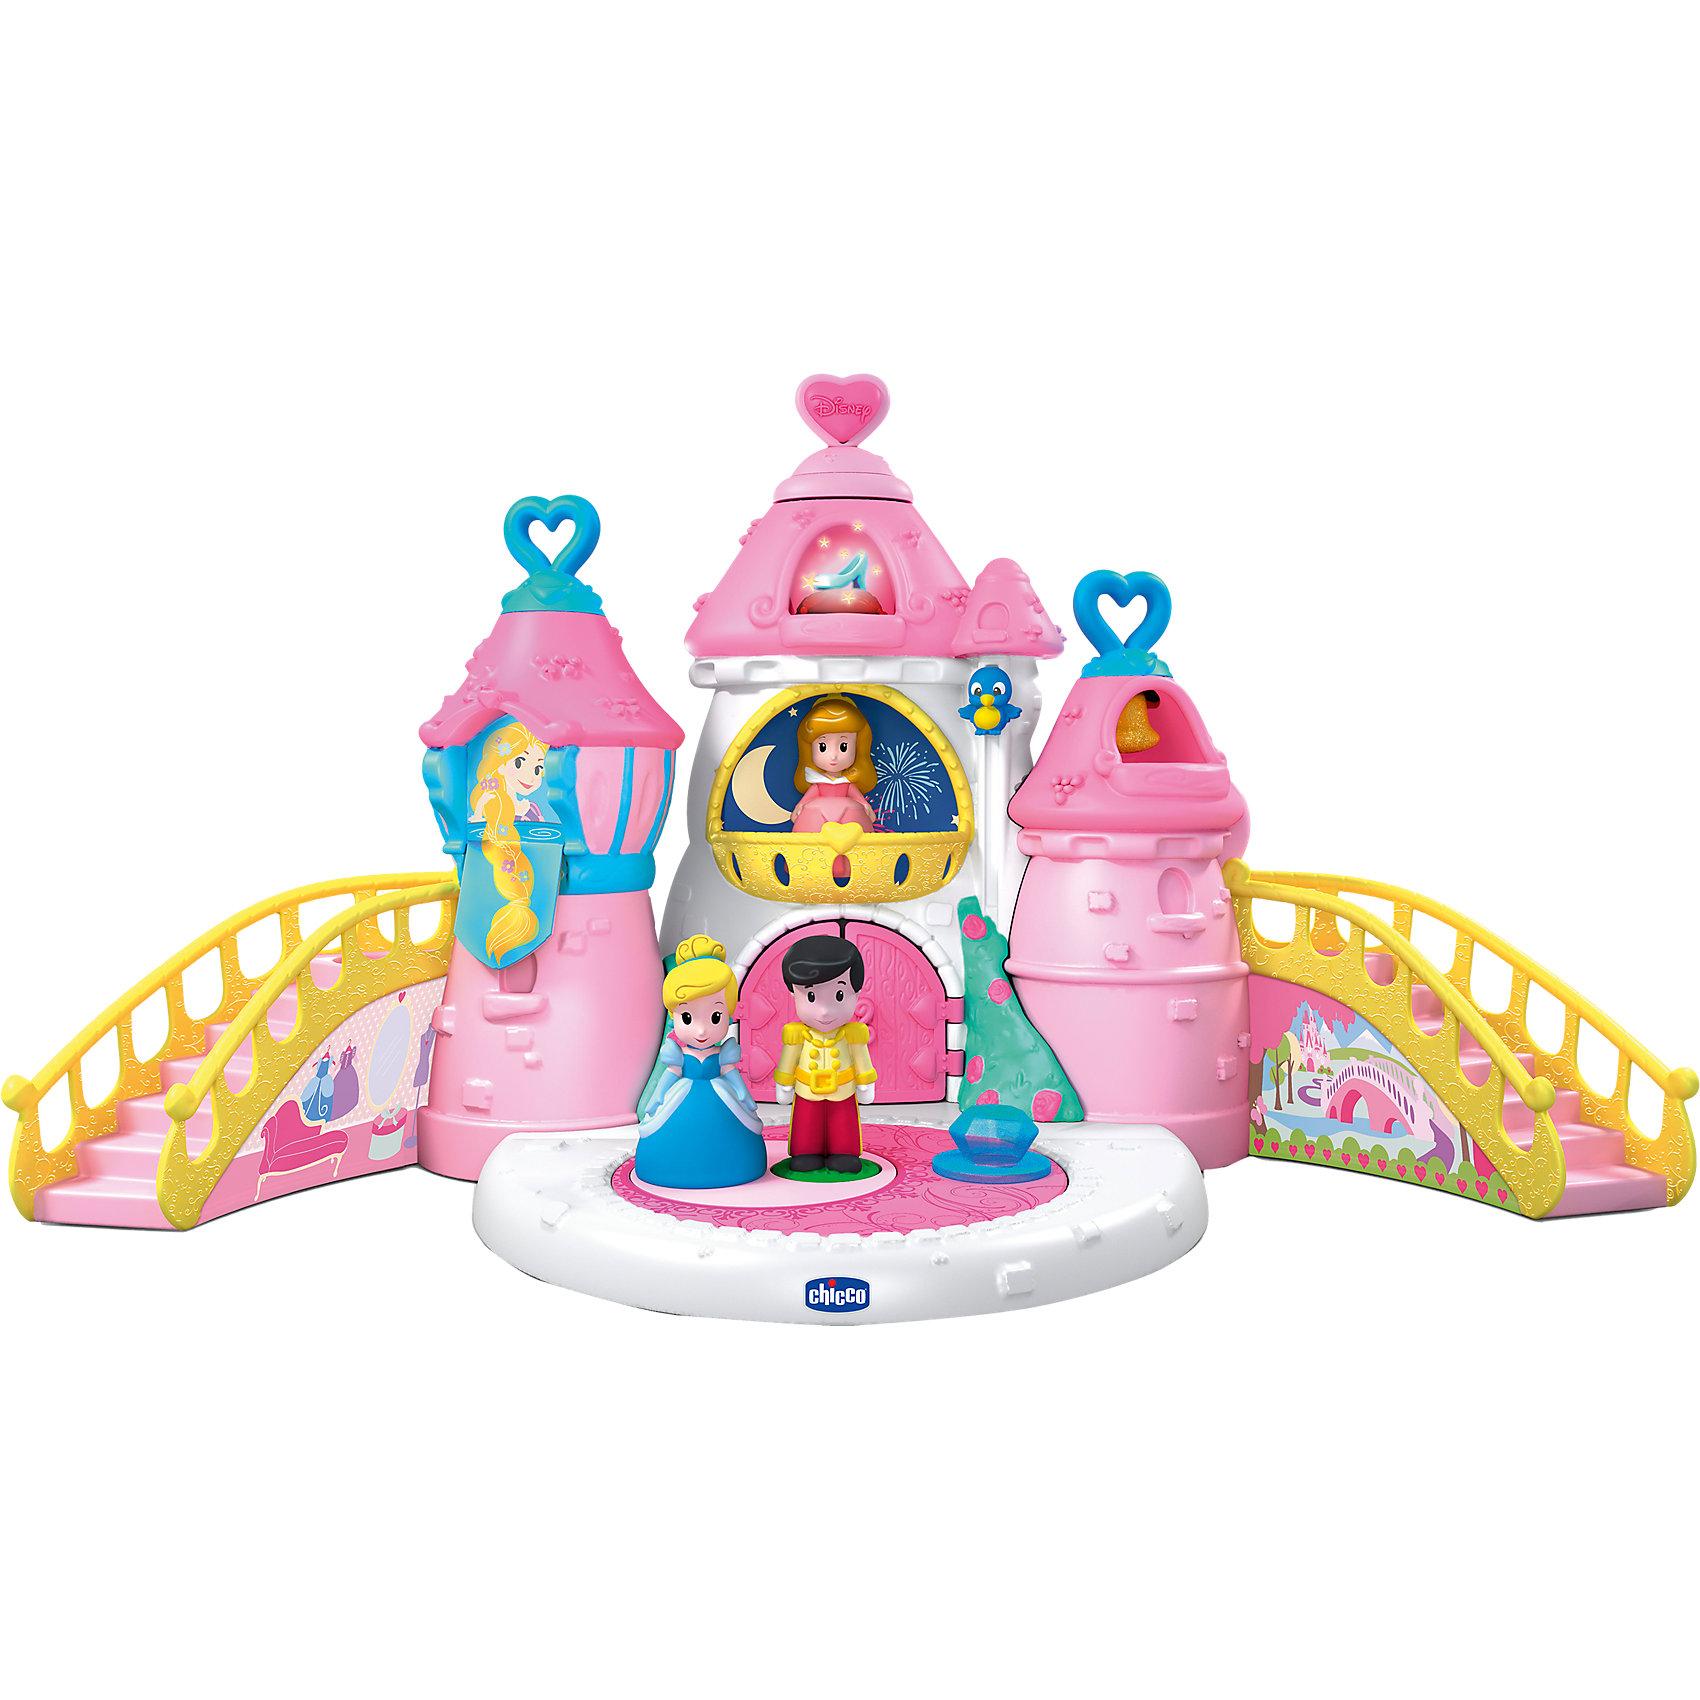 CHICCO Волшебный замок Принцесс Disney, CHICCO chicco волшебный замок принцесс disney